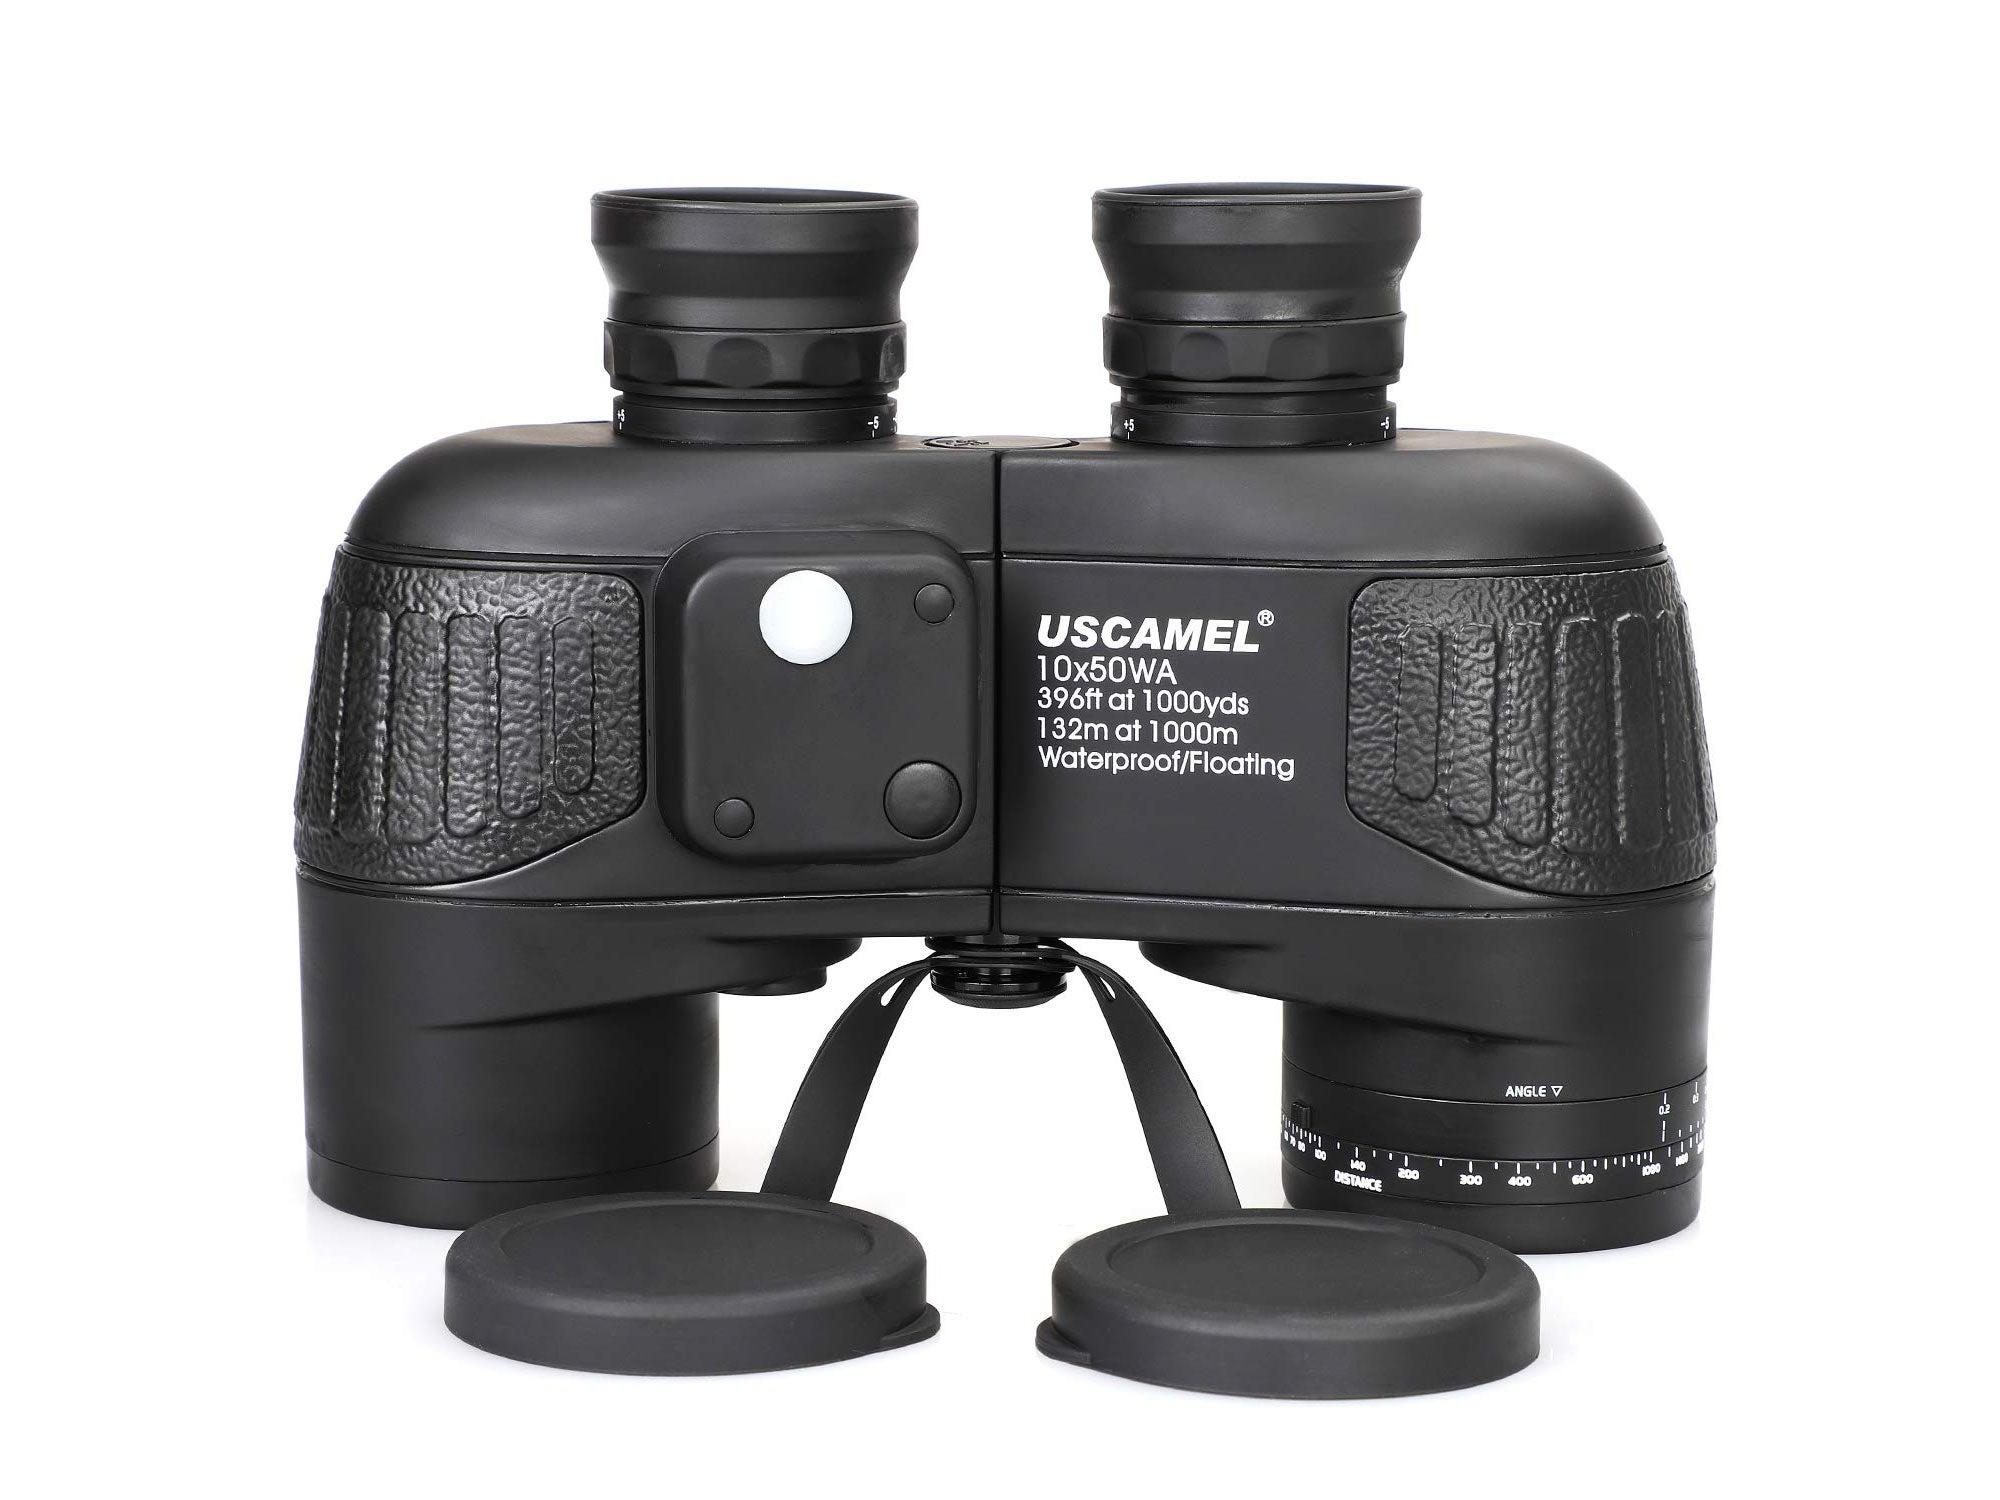 USCAMEL Waterproof Marine Binoculars